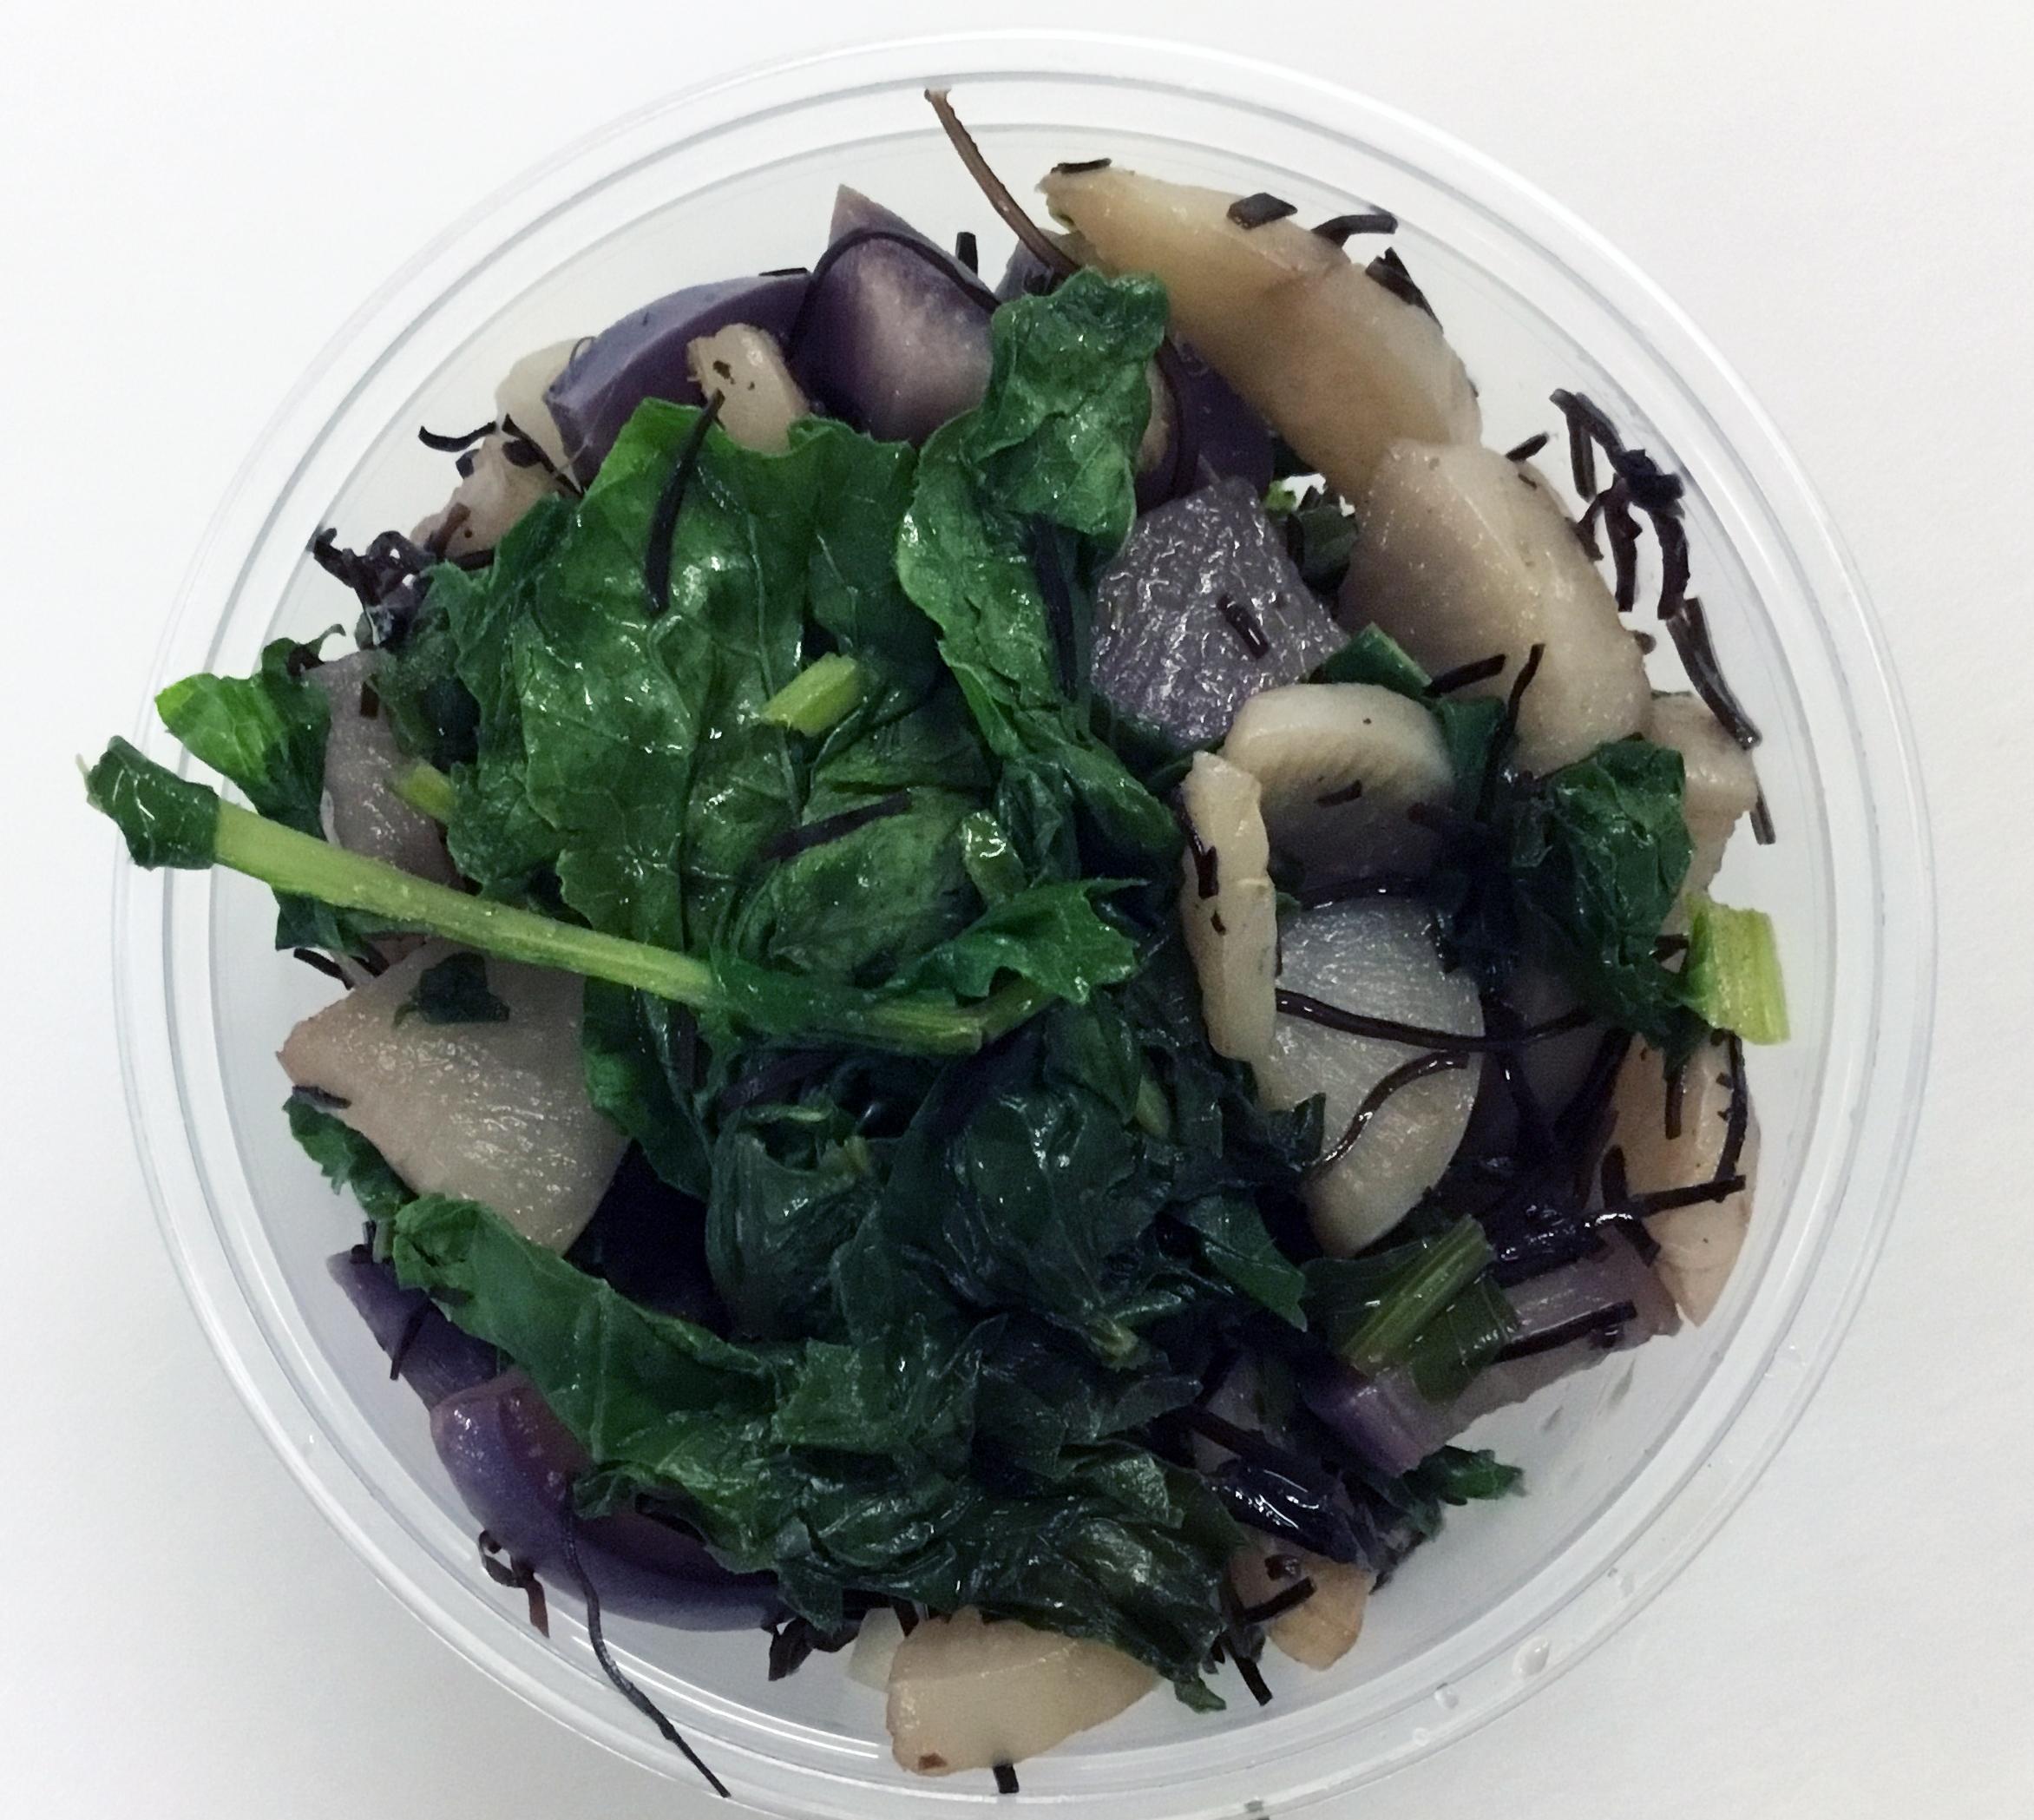 Daikon radish, purple radish, arame (seaweed) and tops.